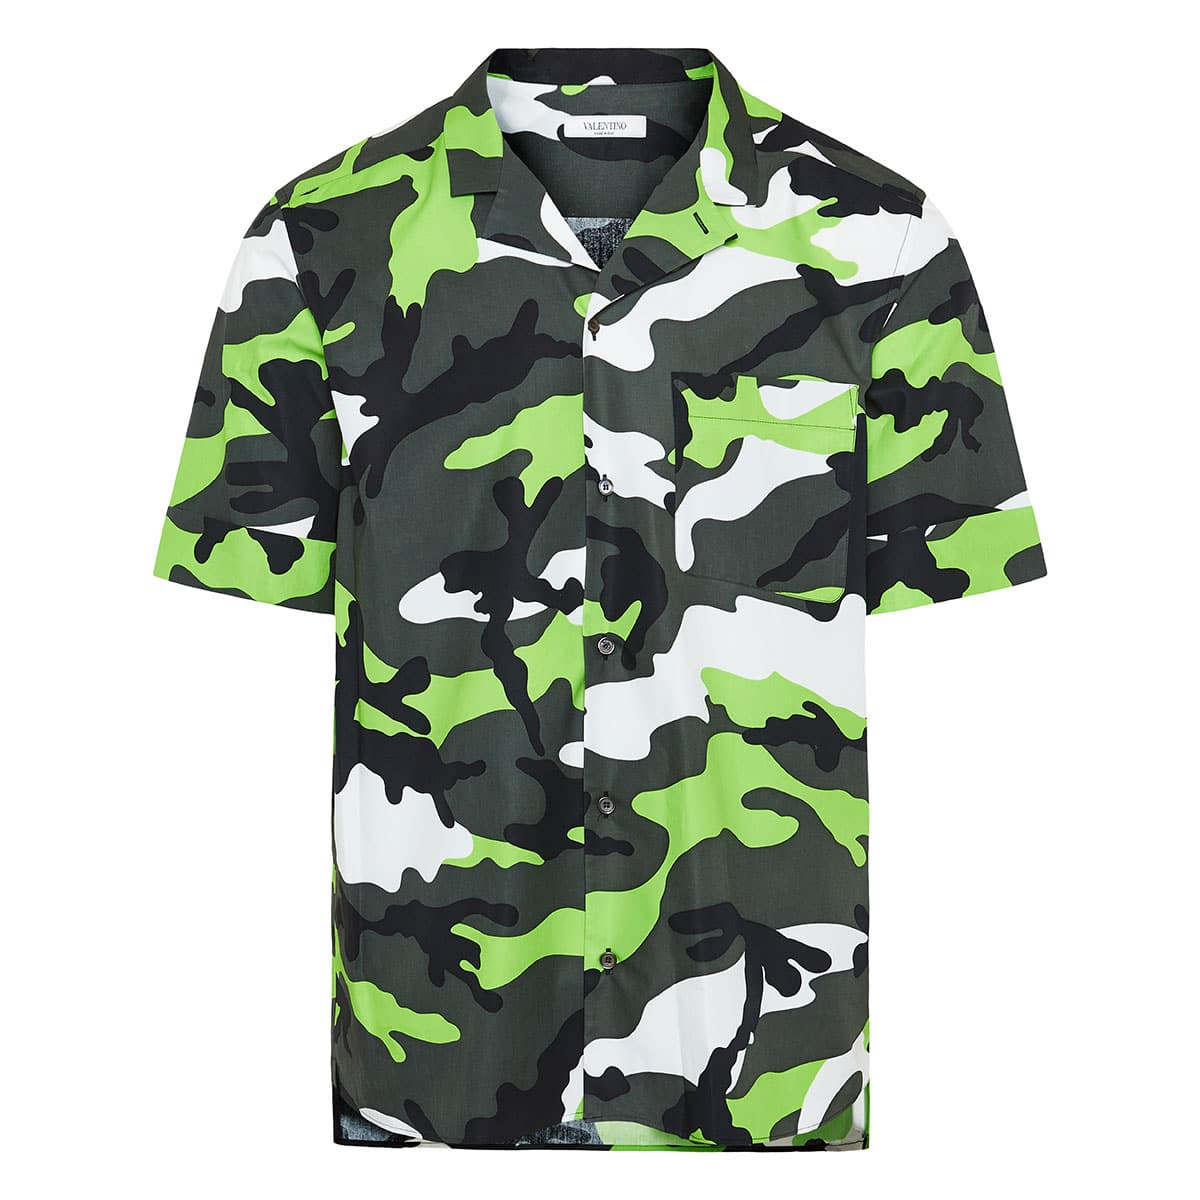 Camouflage short-sleeved shirt